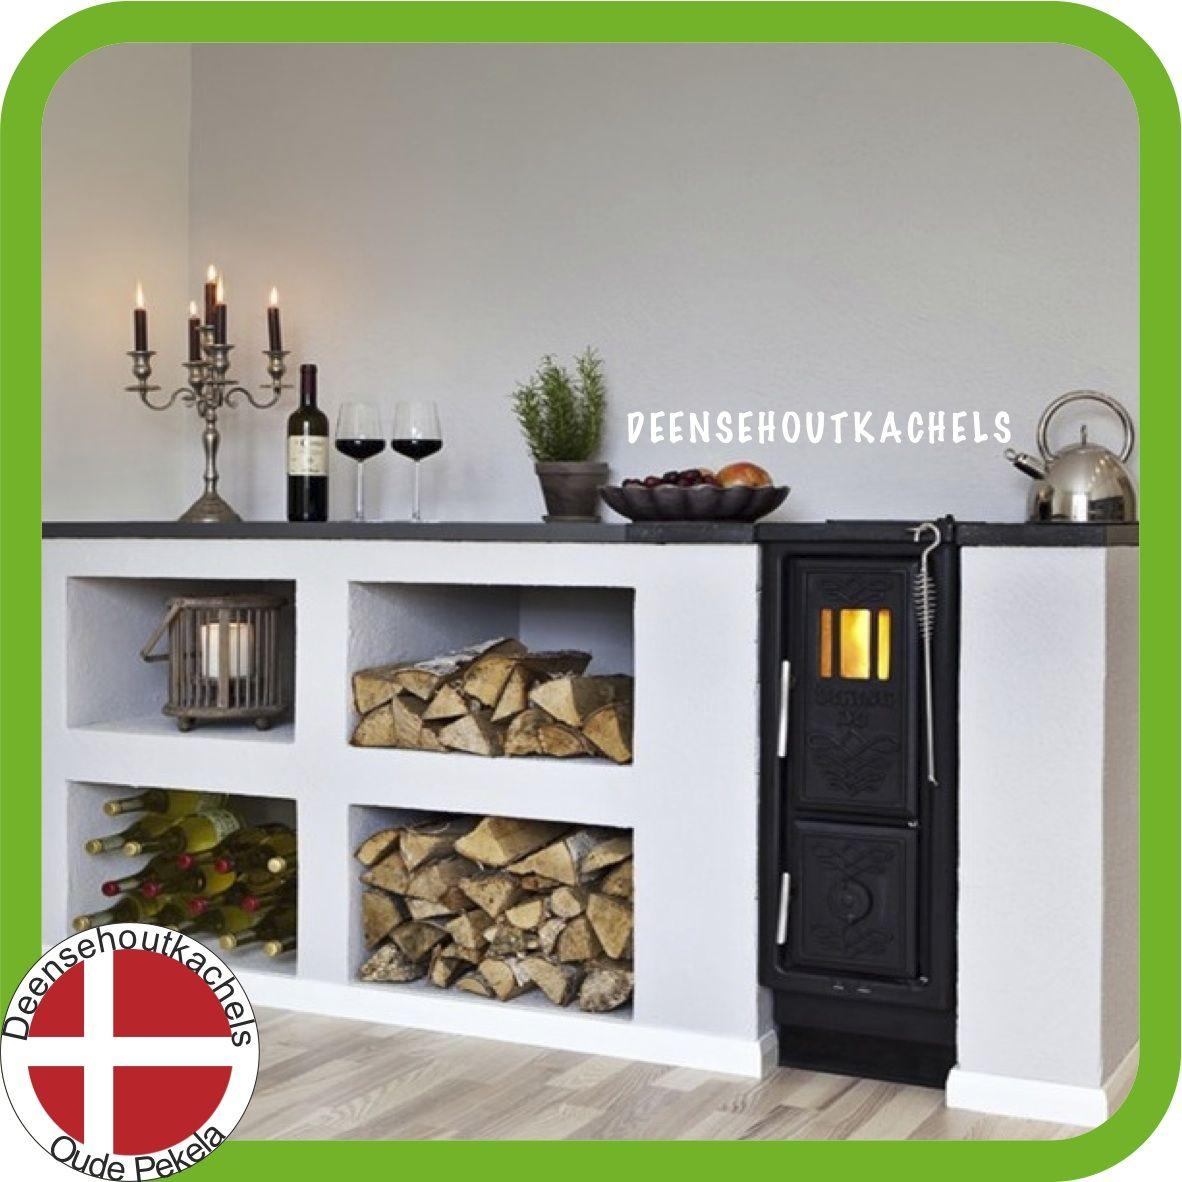 Viva plast wooden colours - Josef Davidssons Viking 30 Kitchen Wood Stove